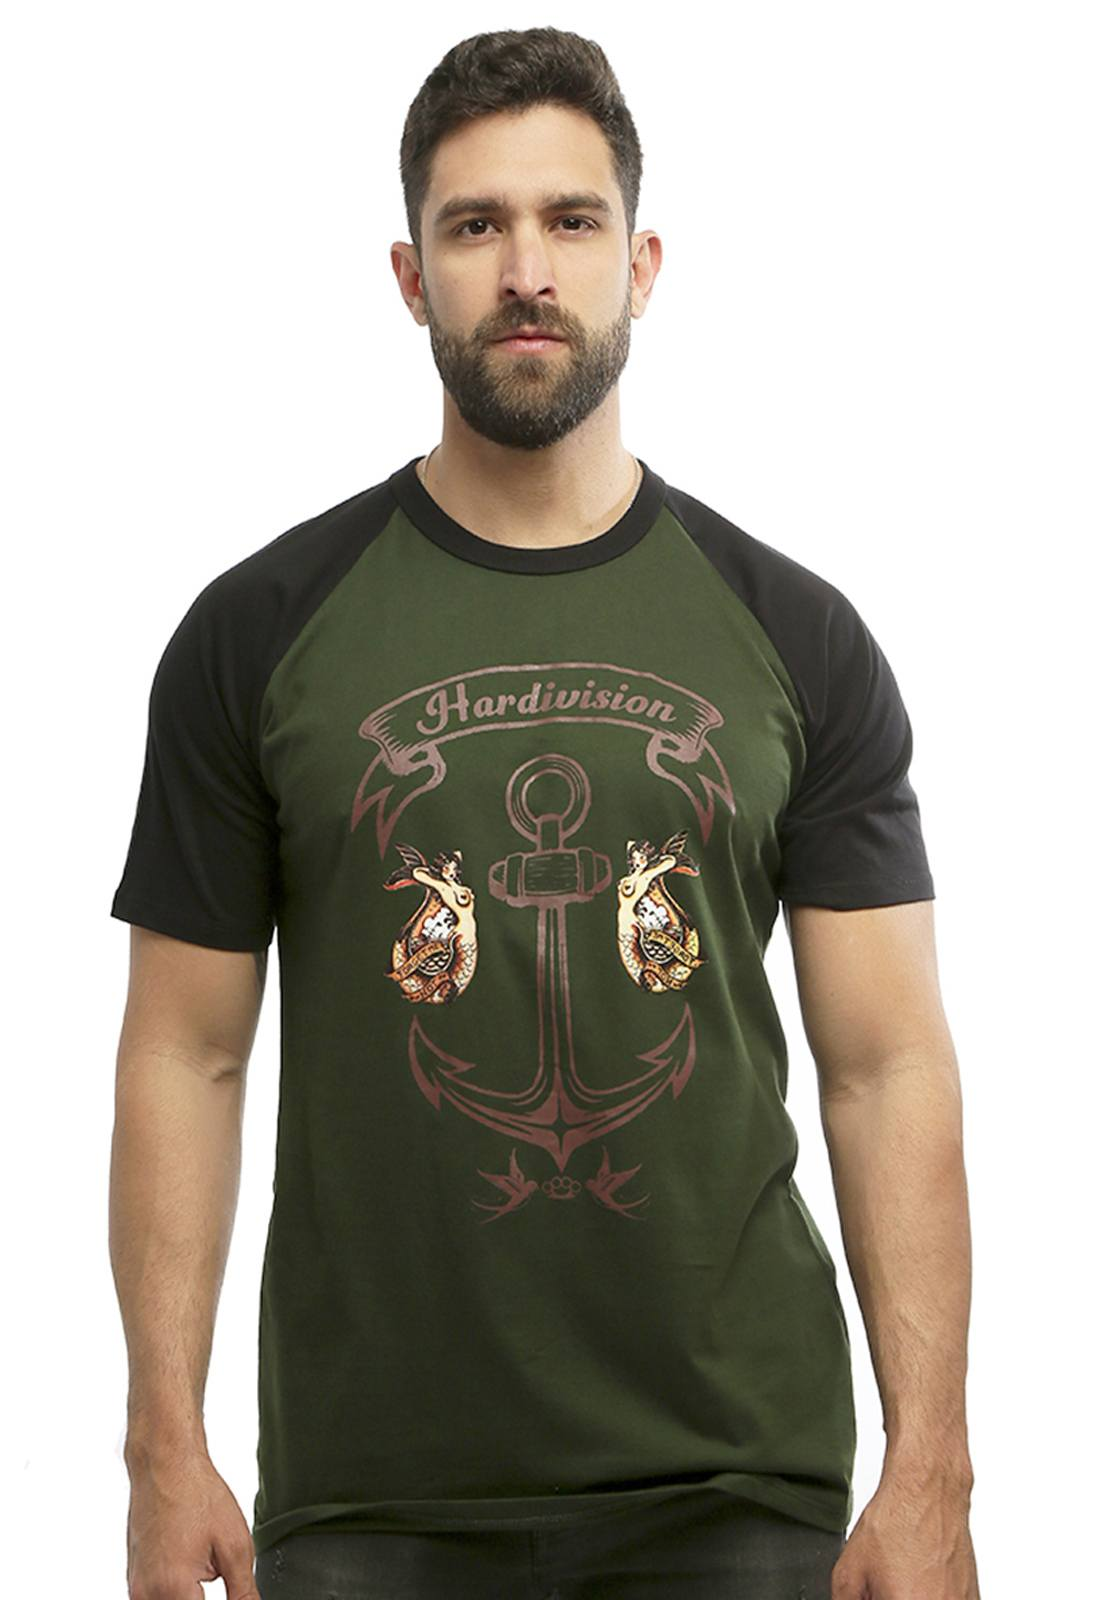 Camiseta masculina verde Âncora Raglan - 100% algodão - Hardivision